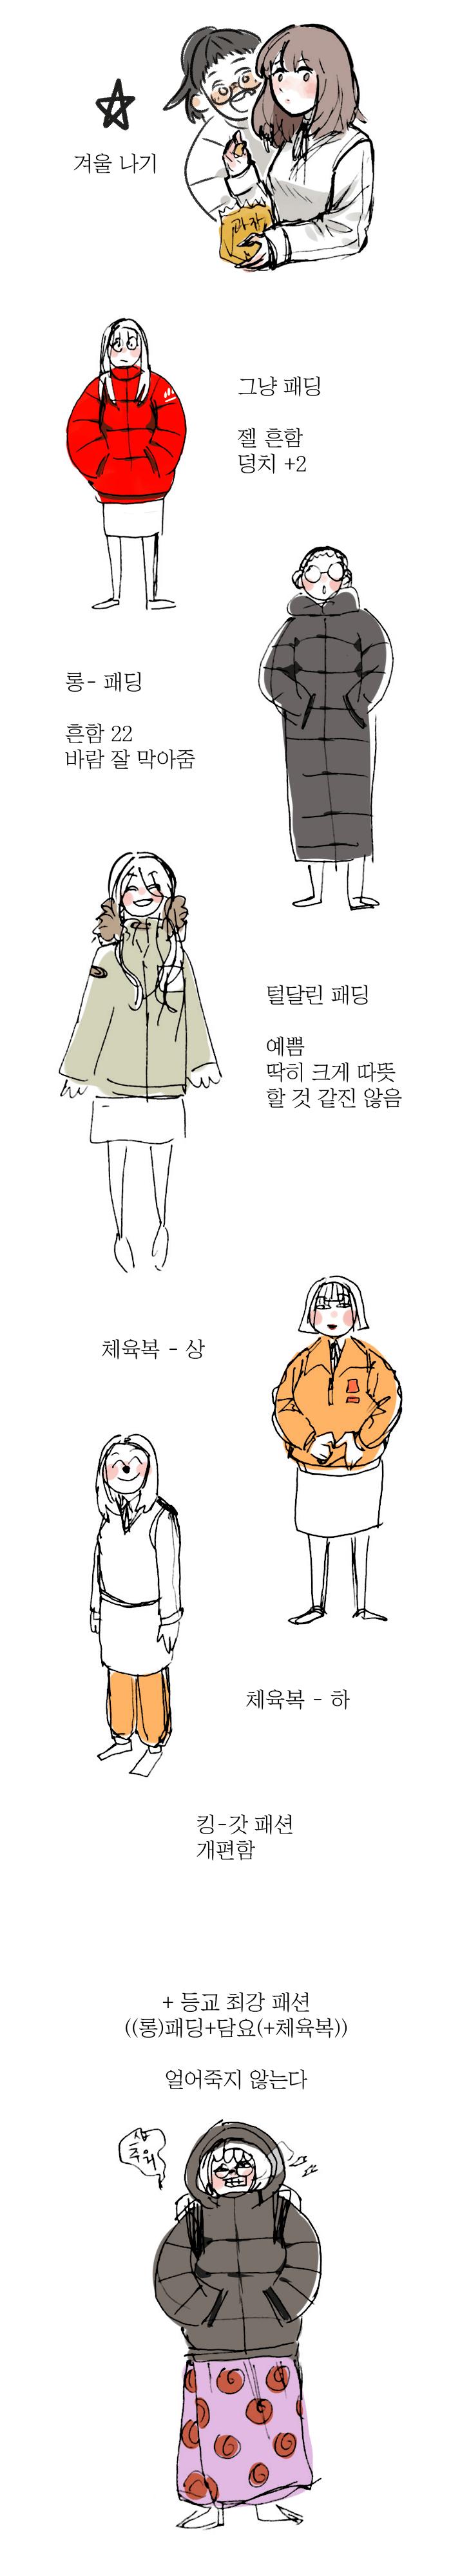 1512781437.png 요즘 여고생 겨울 패션